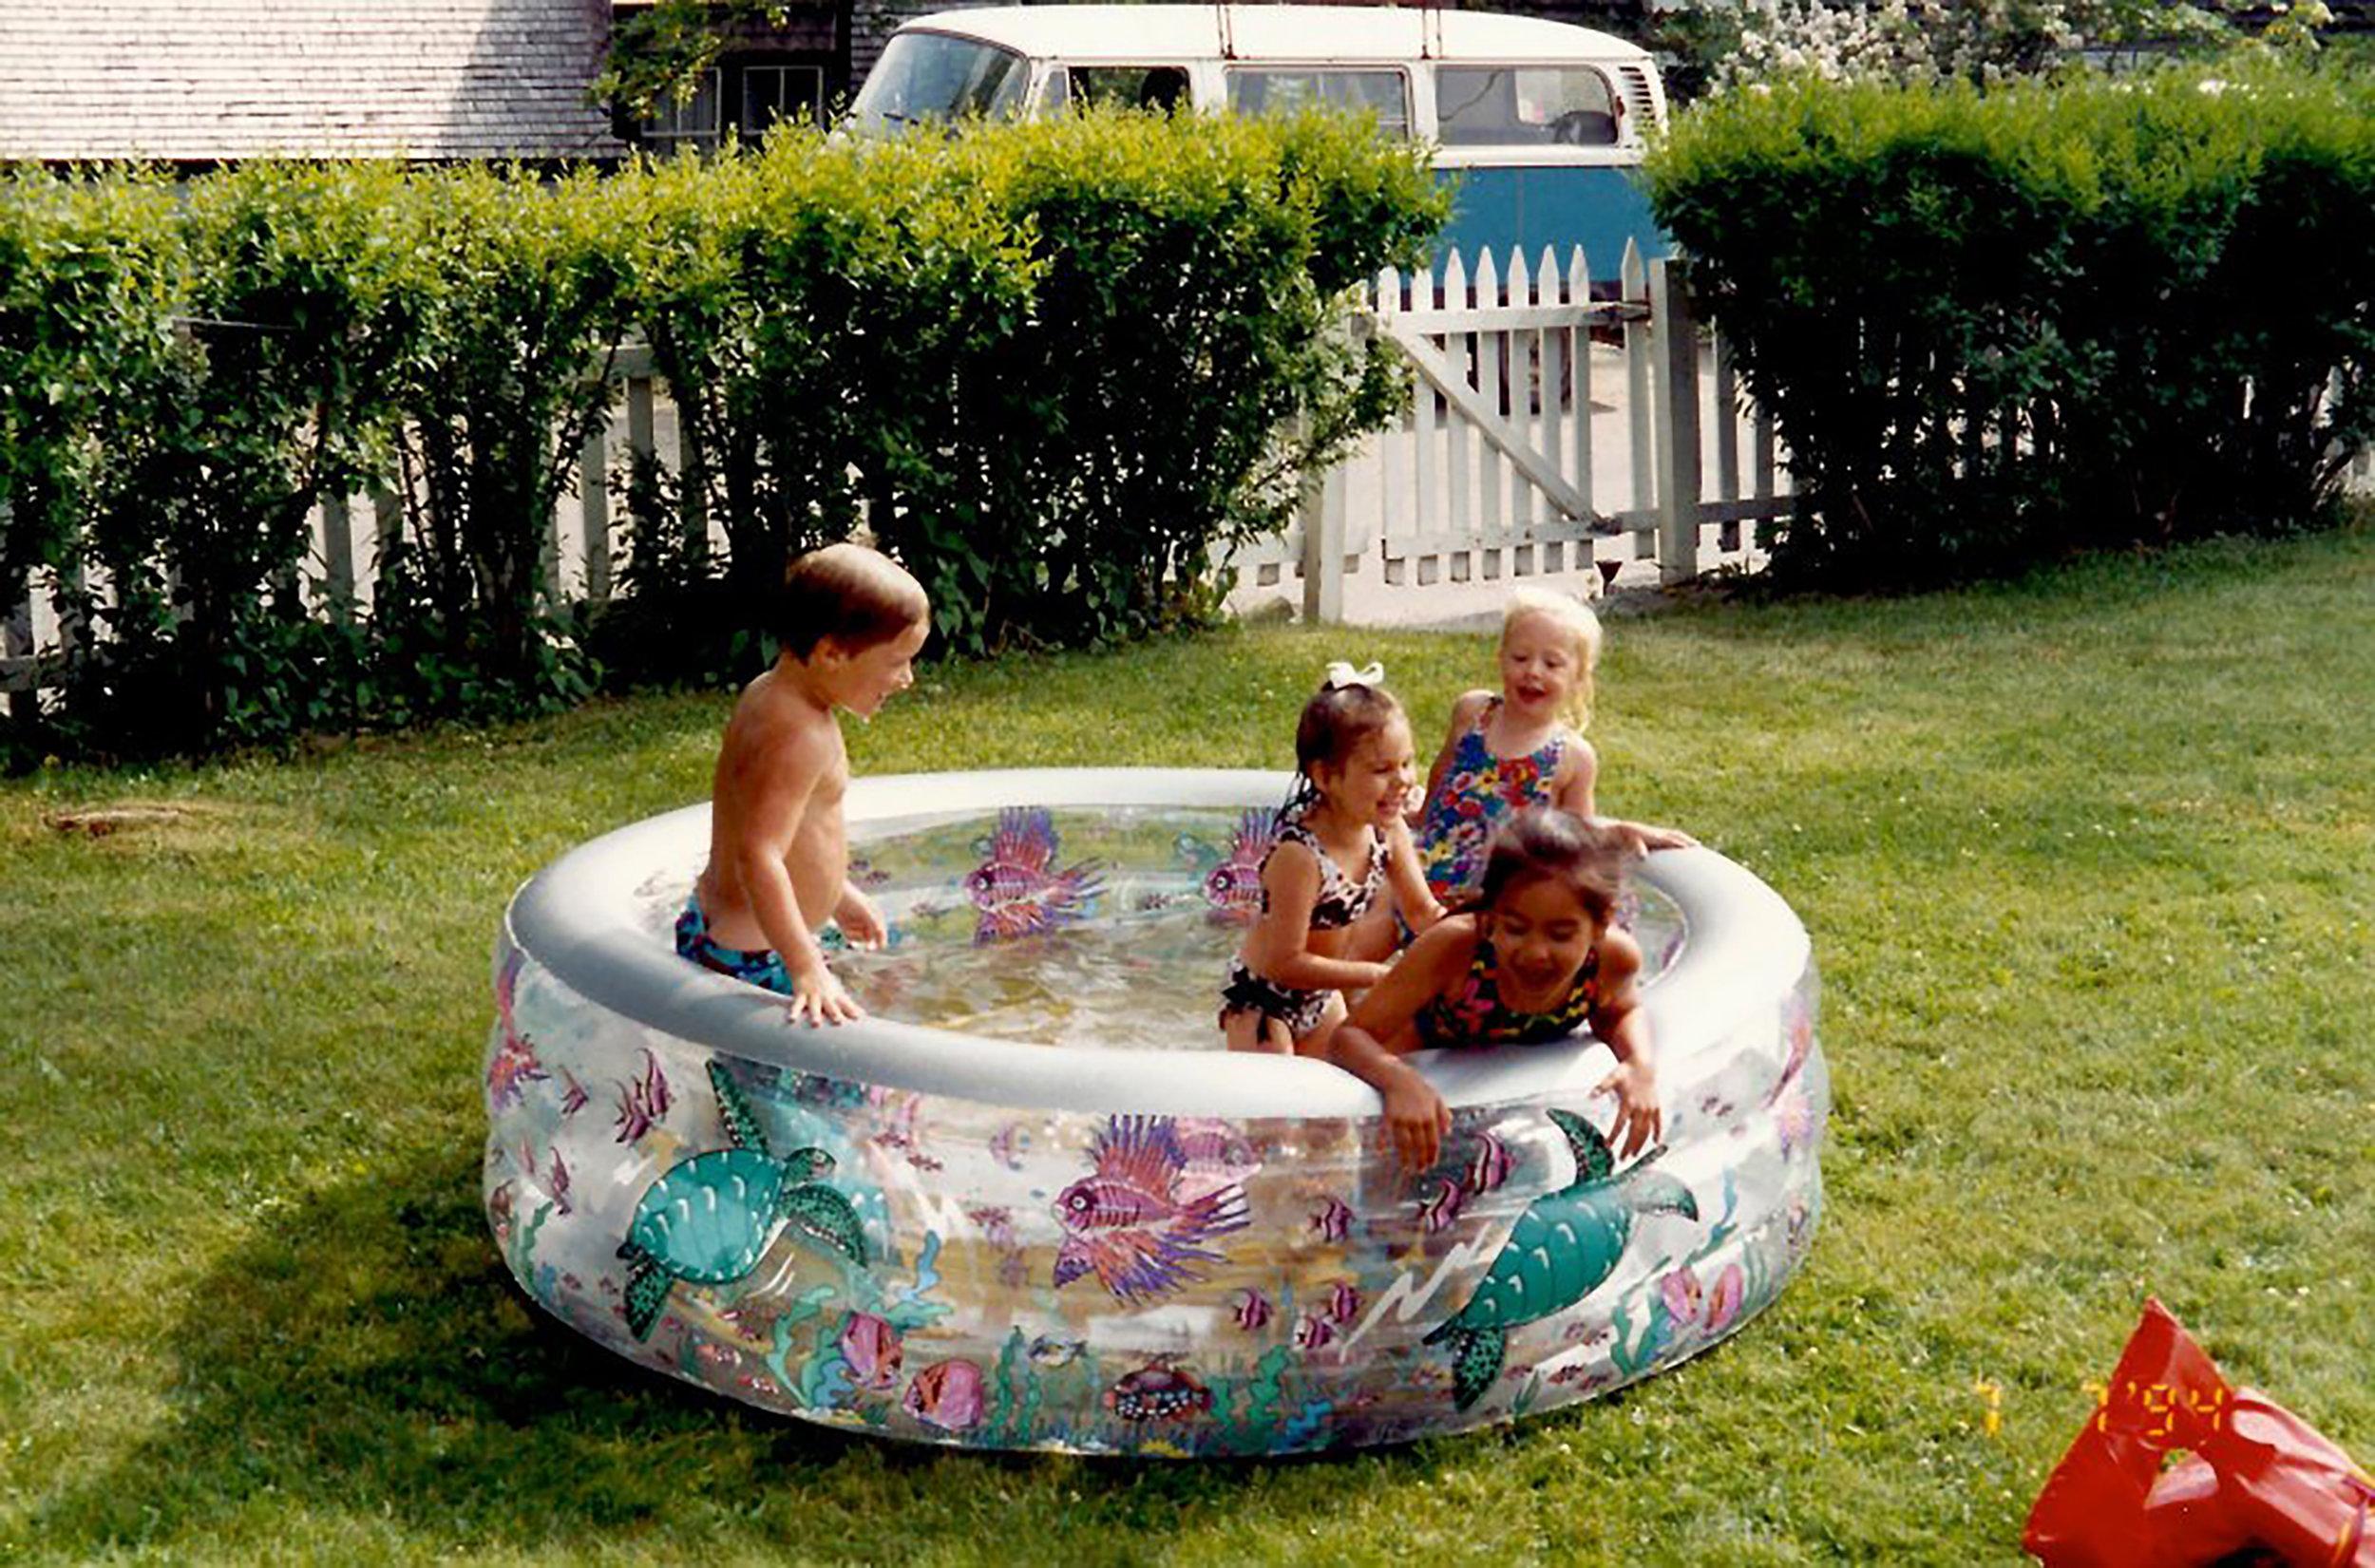 Anna and friends enjoy a summer afternoon